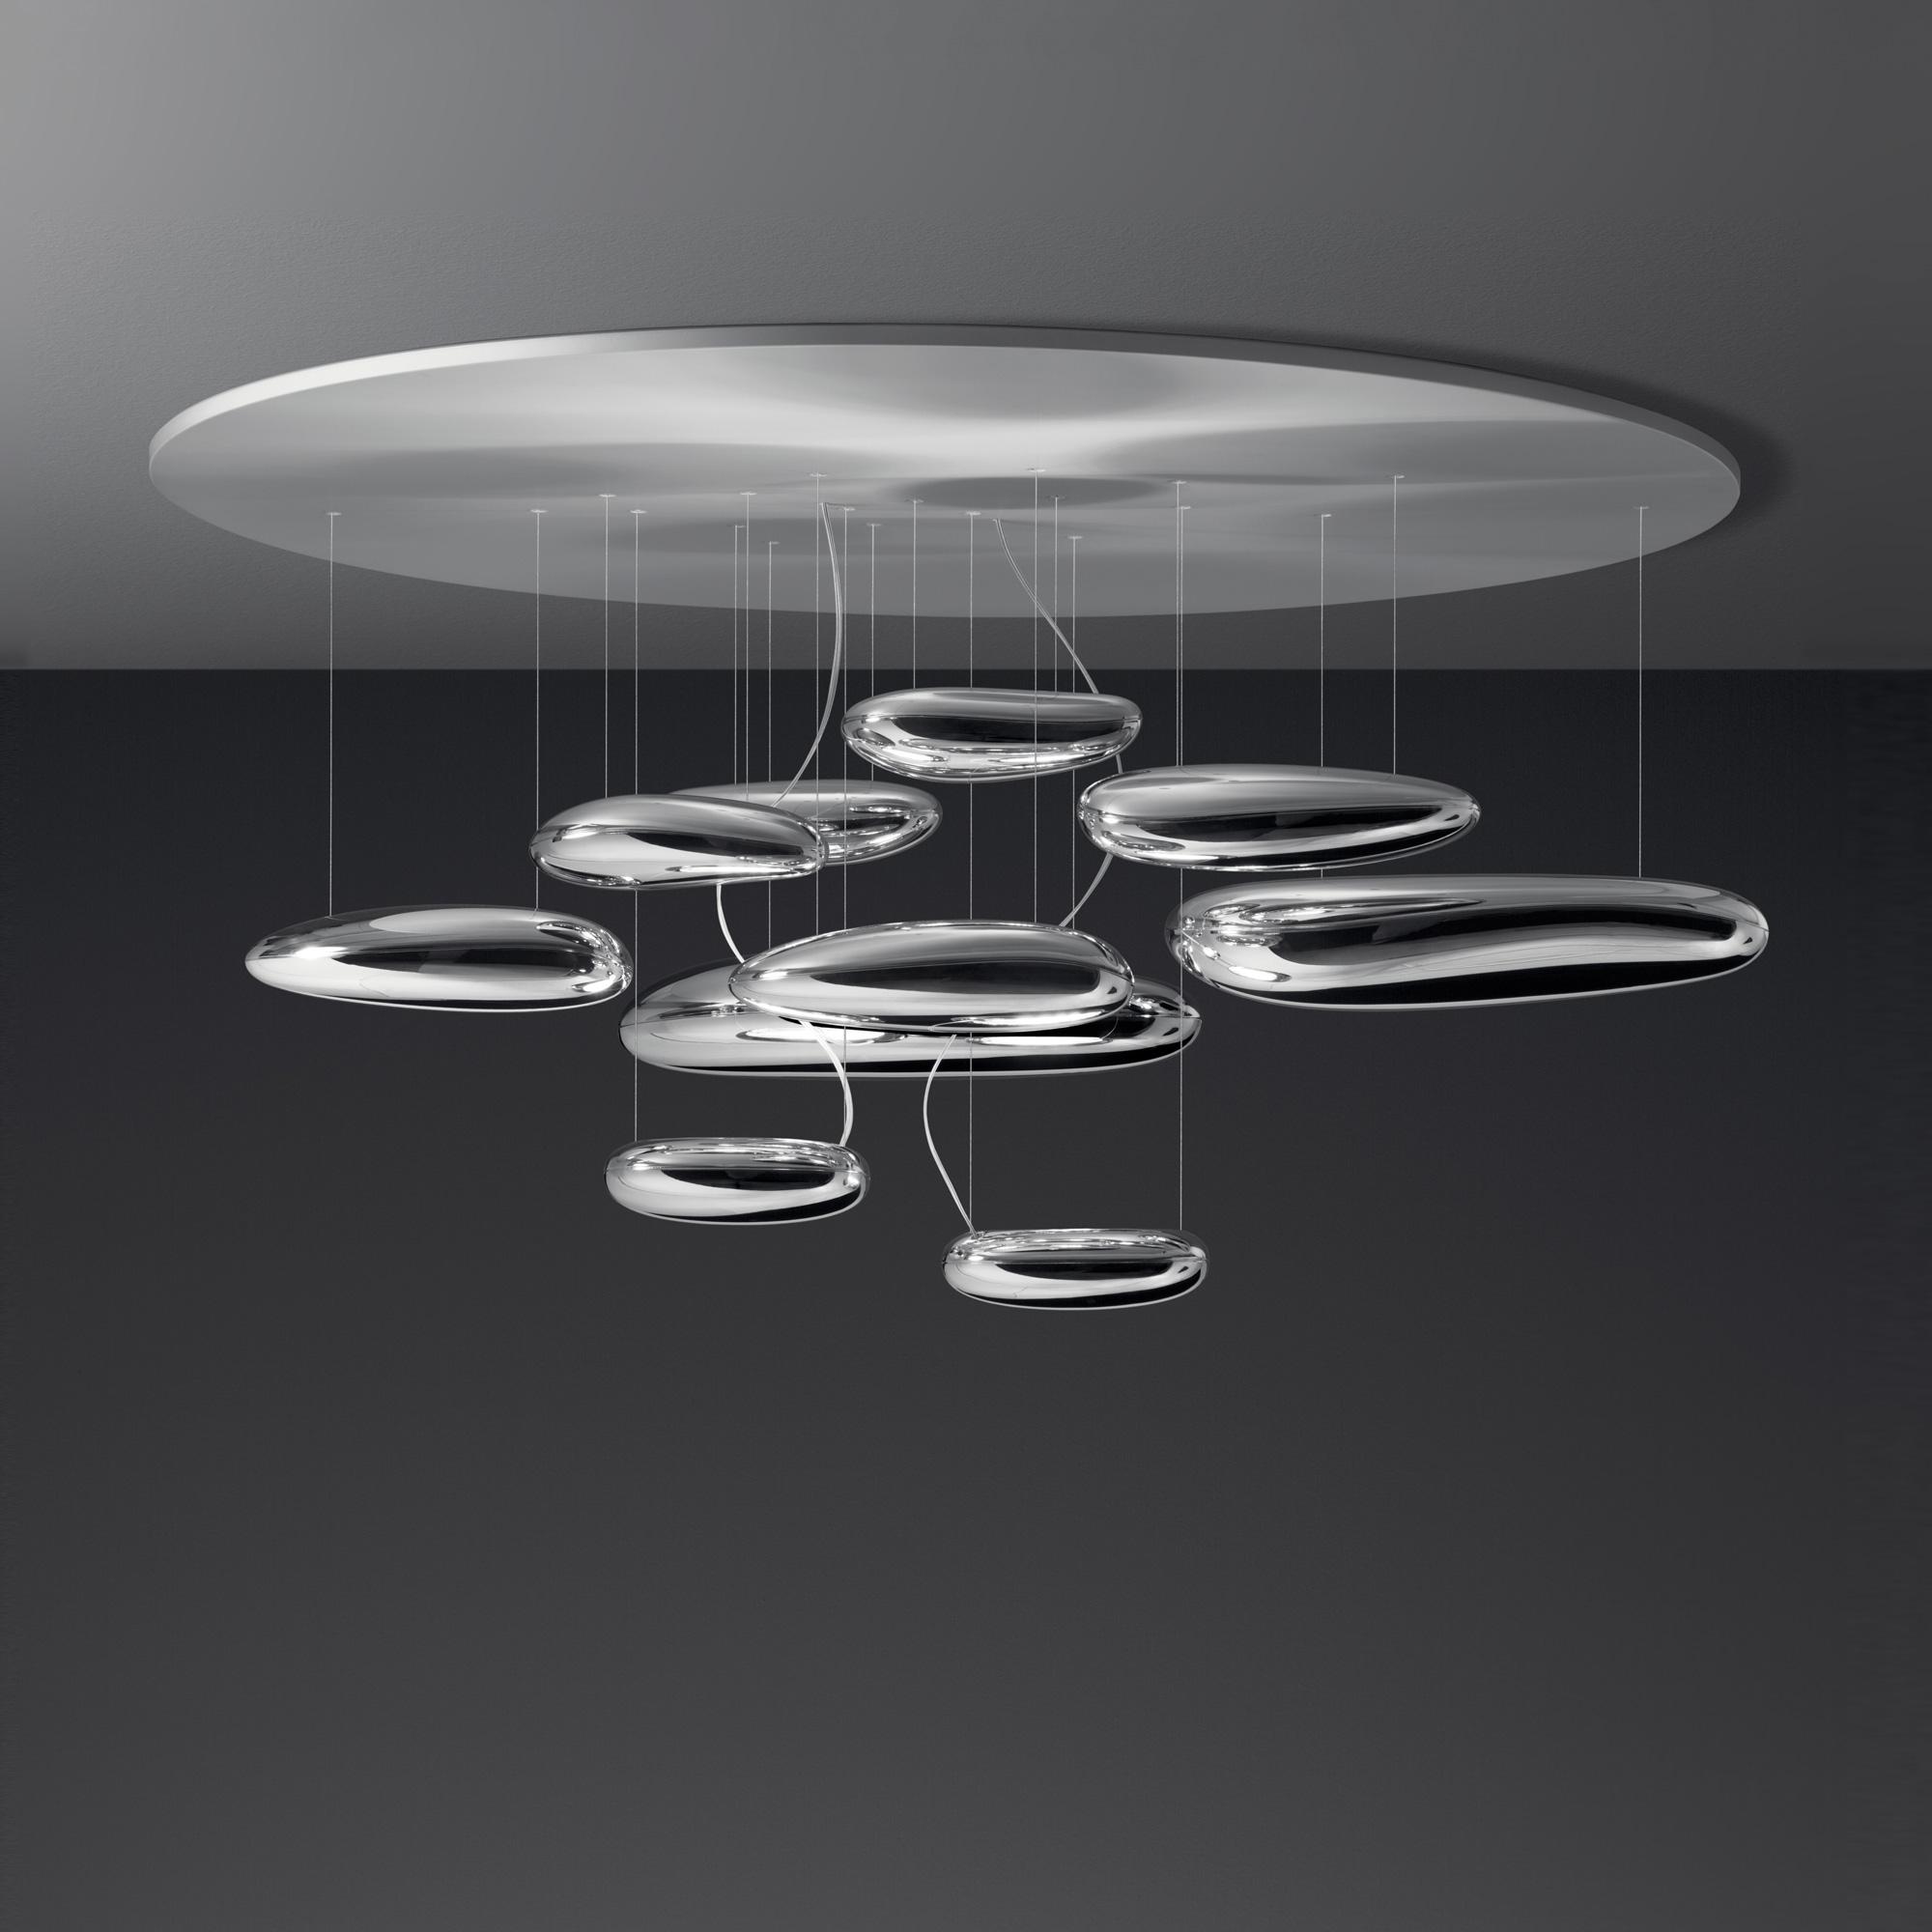 artemide mercury soffitto inox deckenleuchte 1396110a reuter onlineshop. Black Bedroom Furniture Sets. Home Design Ideas